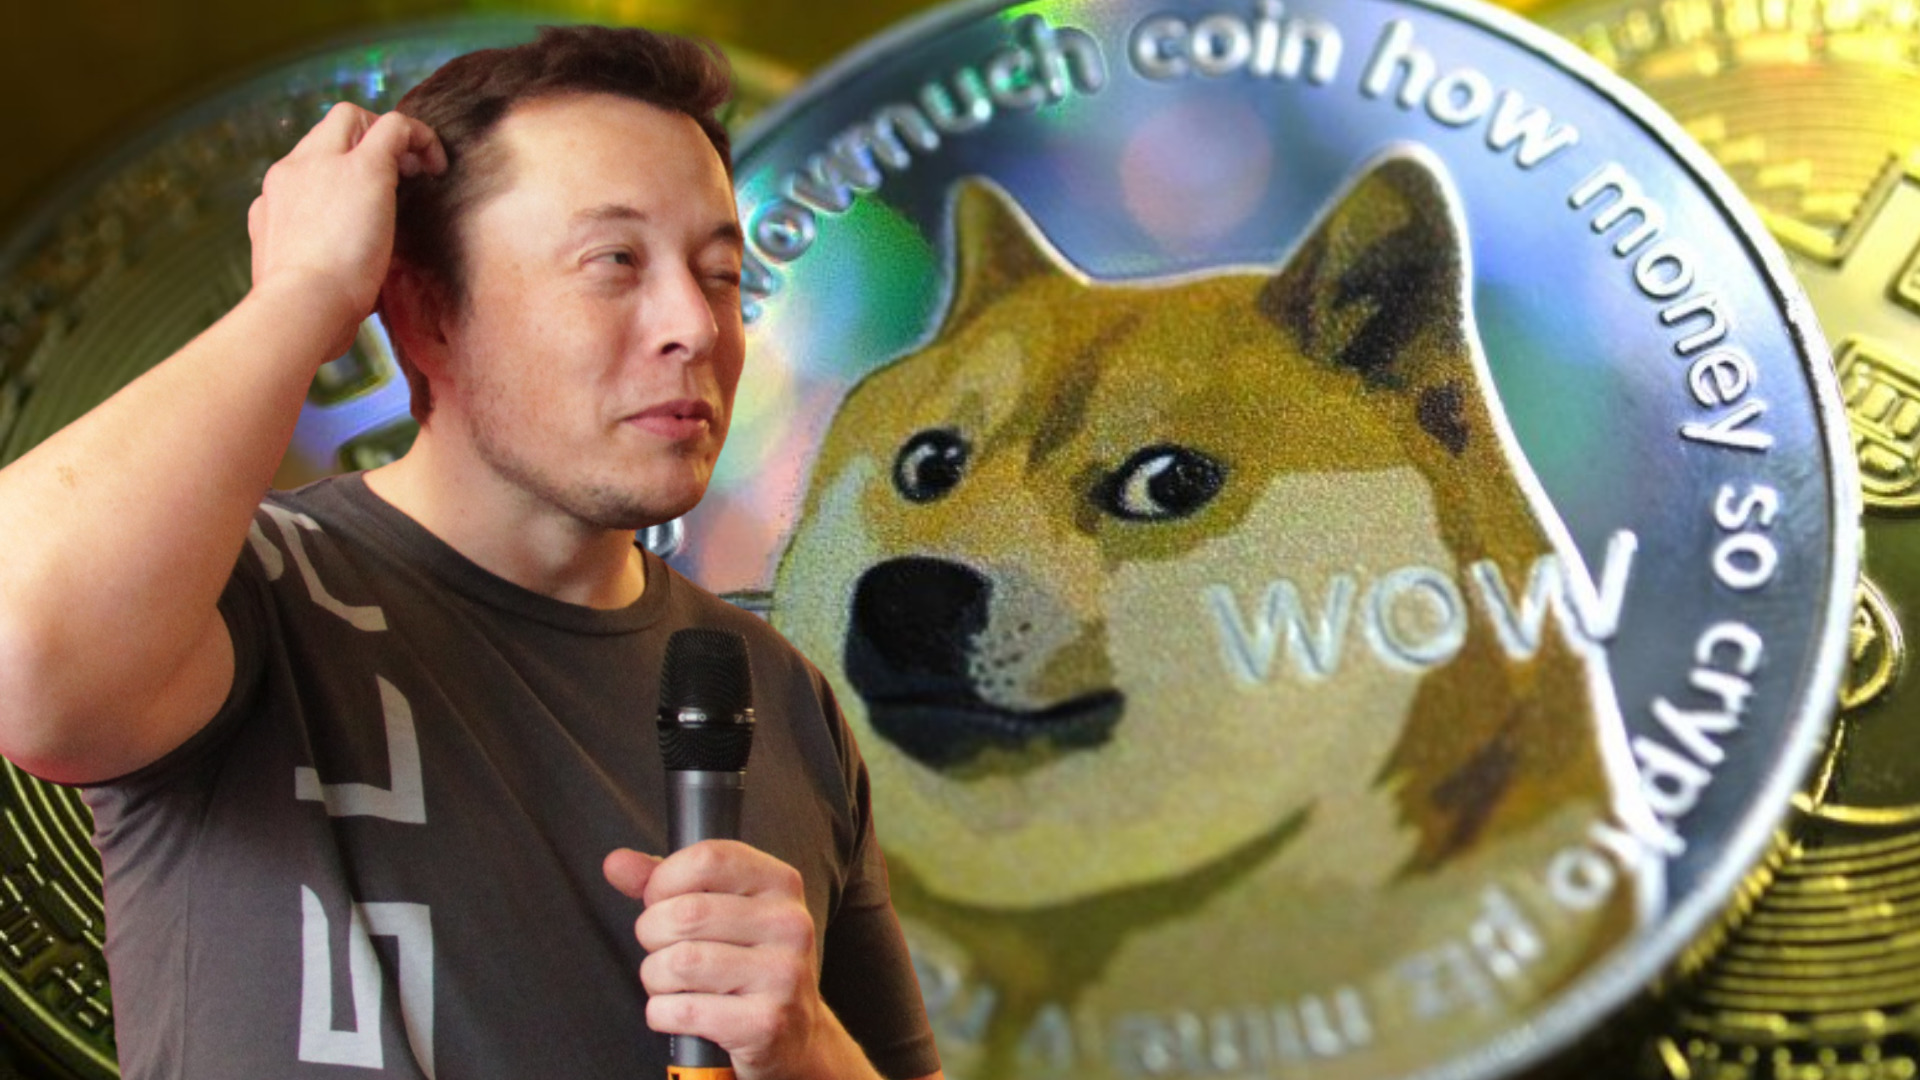 -Yeah-it-s-a-hustle-Dogecoin-bricht-nach-Elon-Musk-Auftritt-bei-SNL-ein